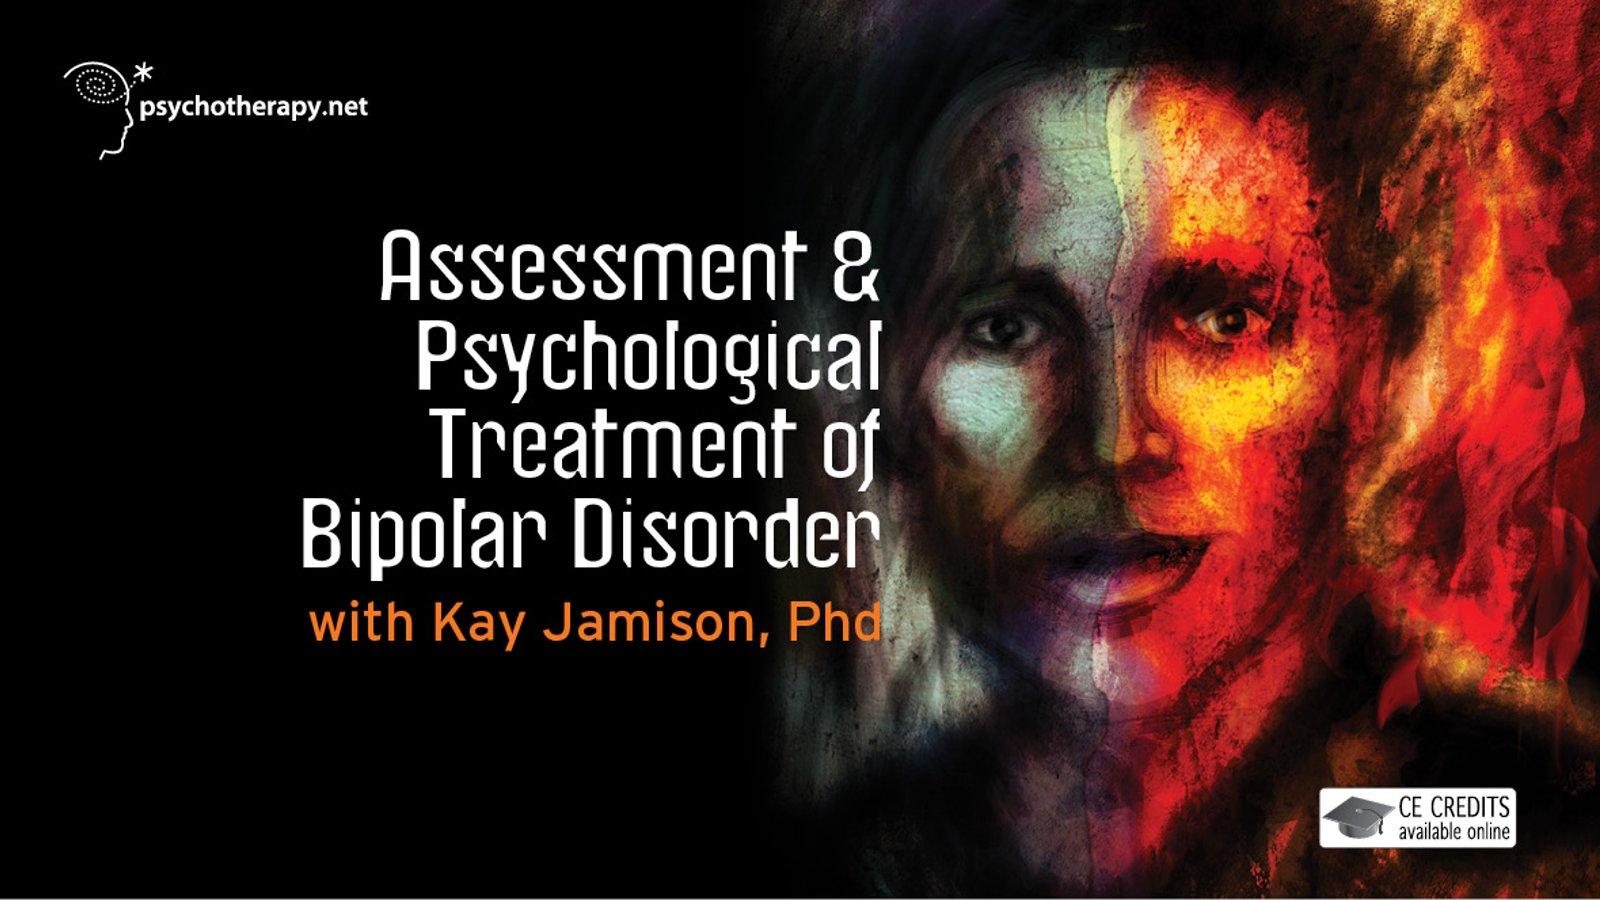 Assessment & Psychological Treatment of Bipolar Disorder